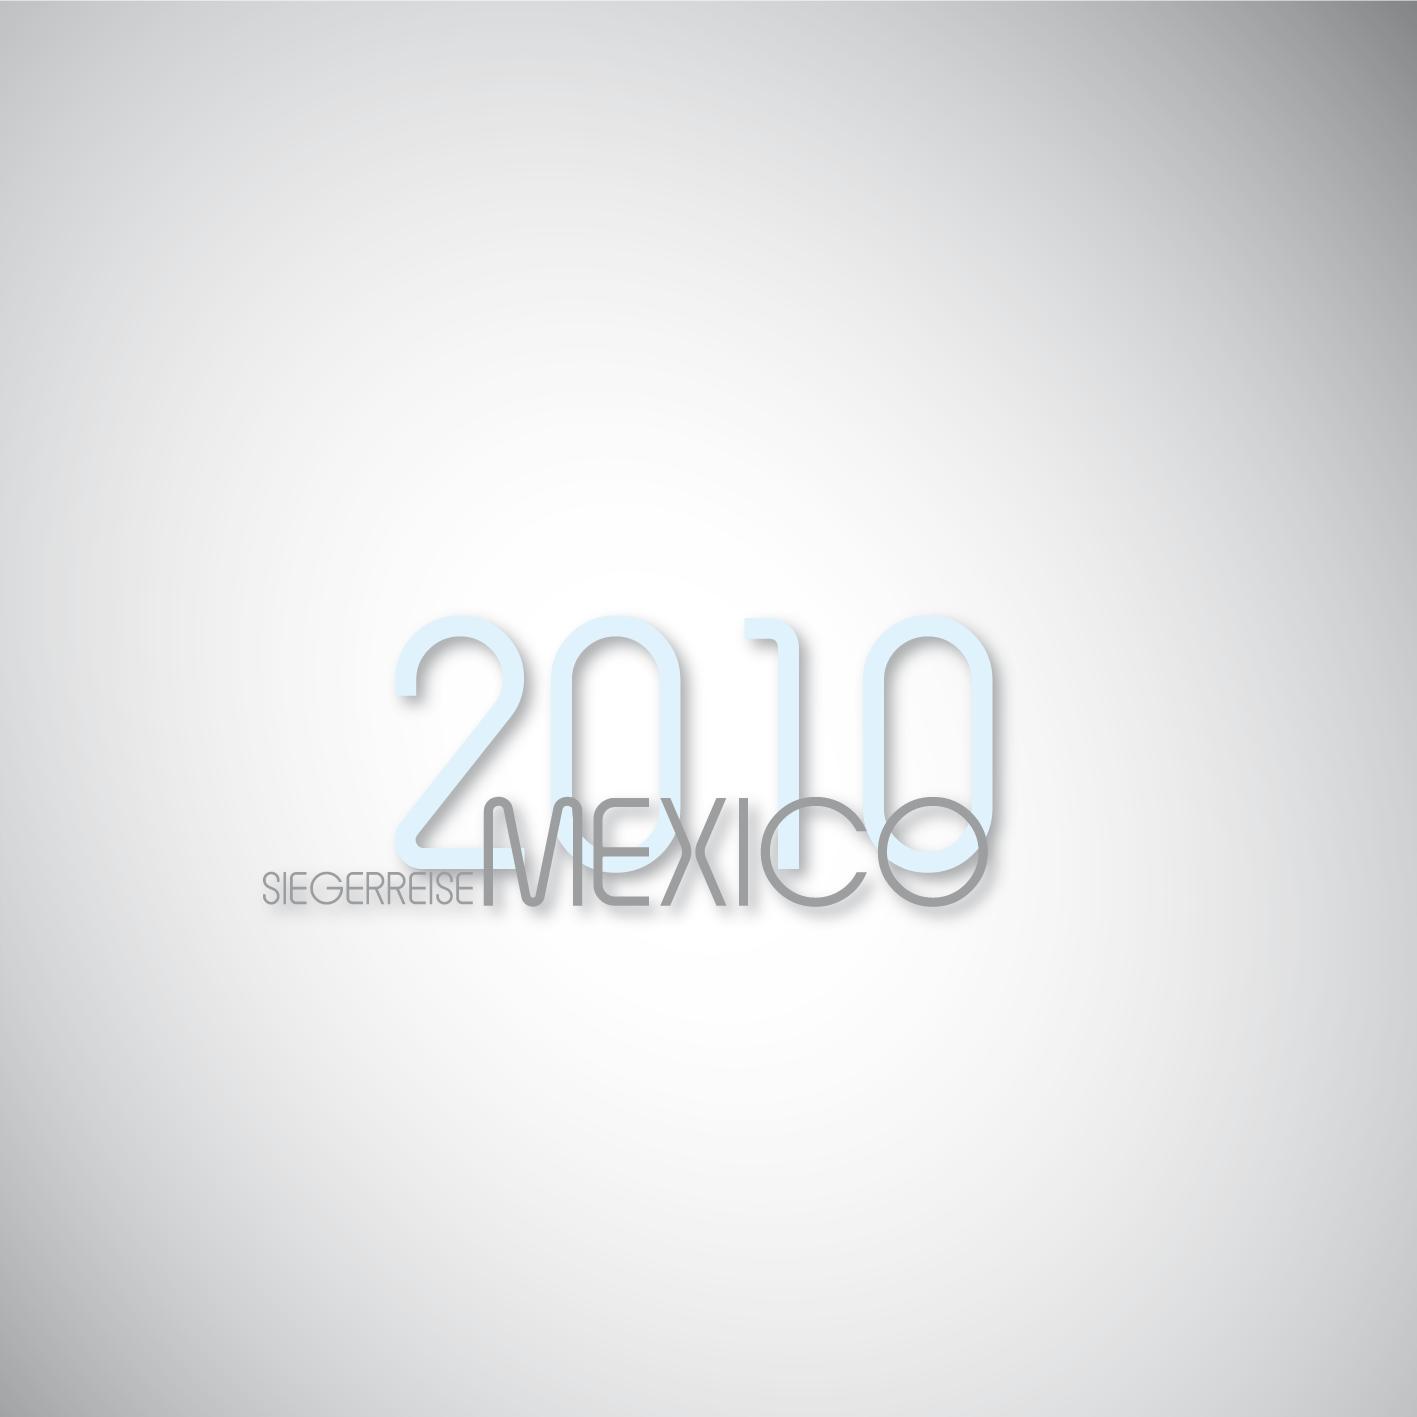 Mex2010_1